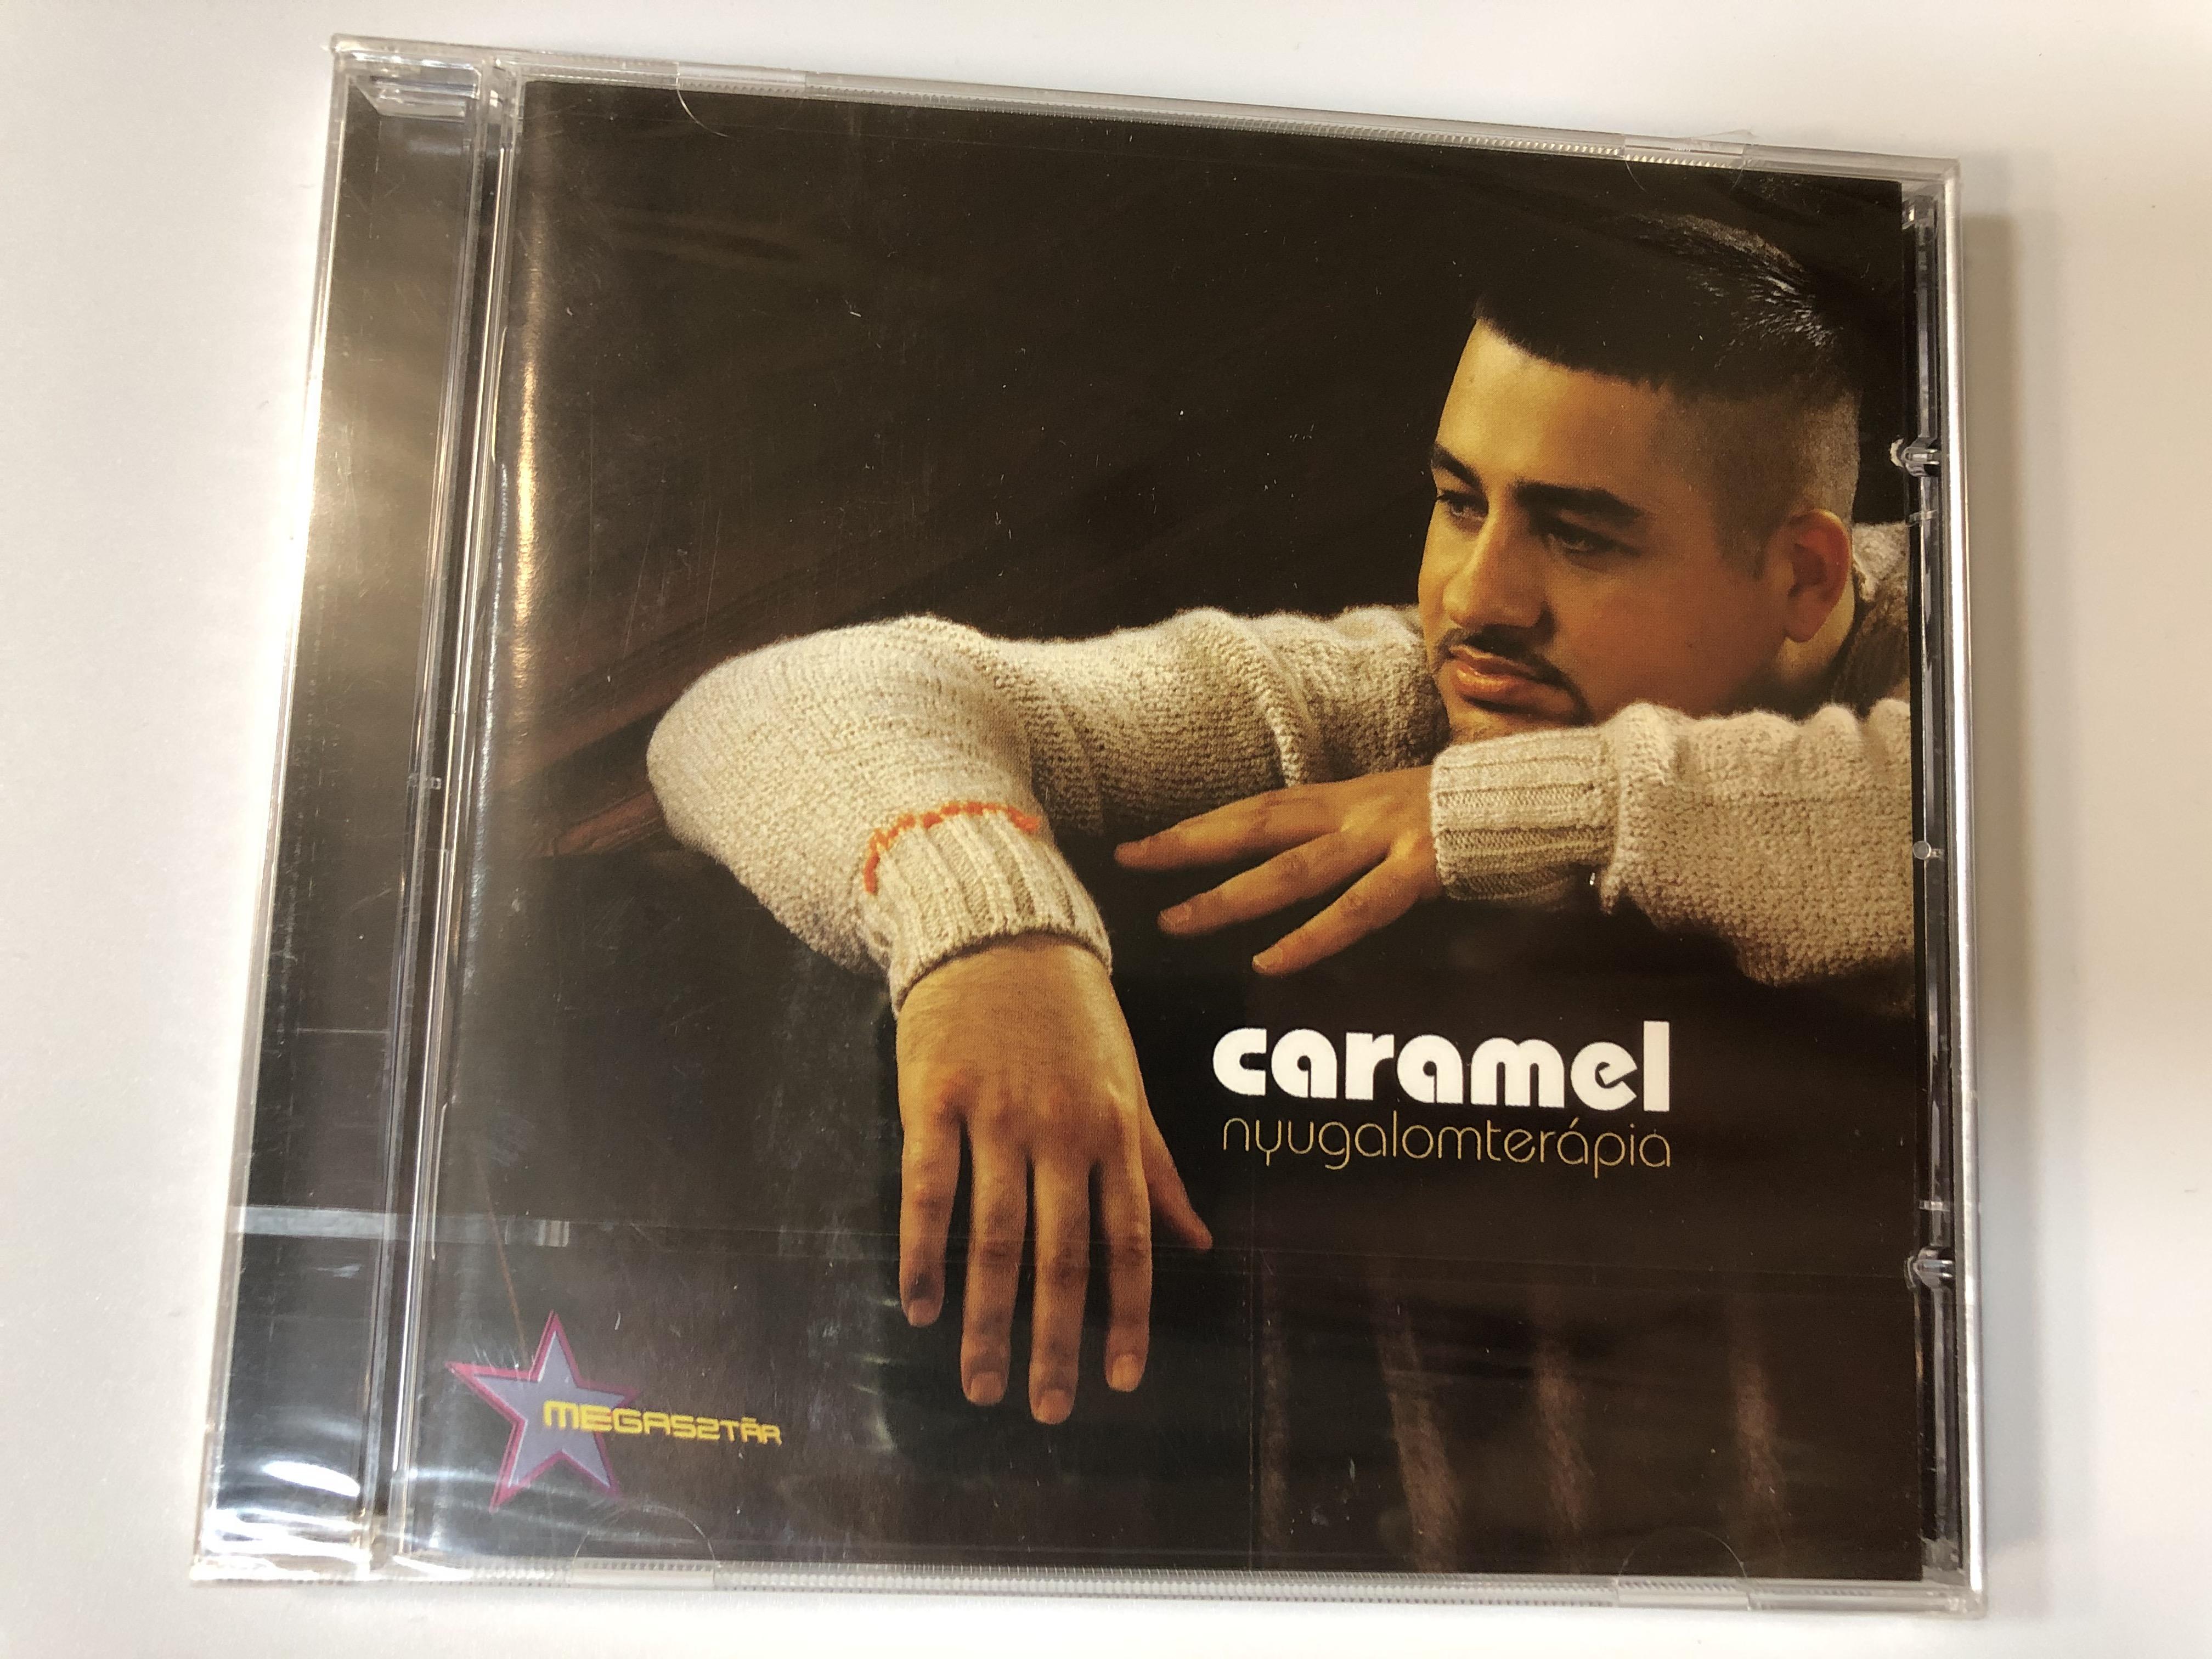 caramel-nyugalomter-pia-tom-tom-records-audio-cd-2005-ttcd-79-1-.jpg